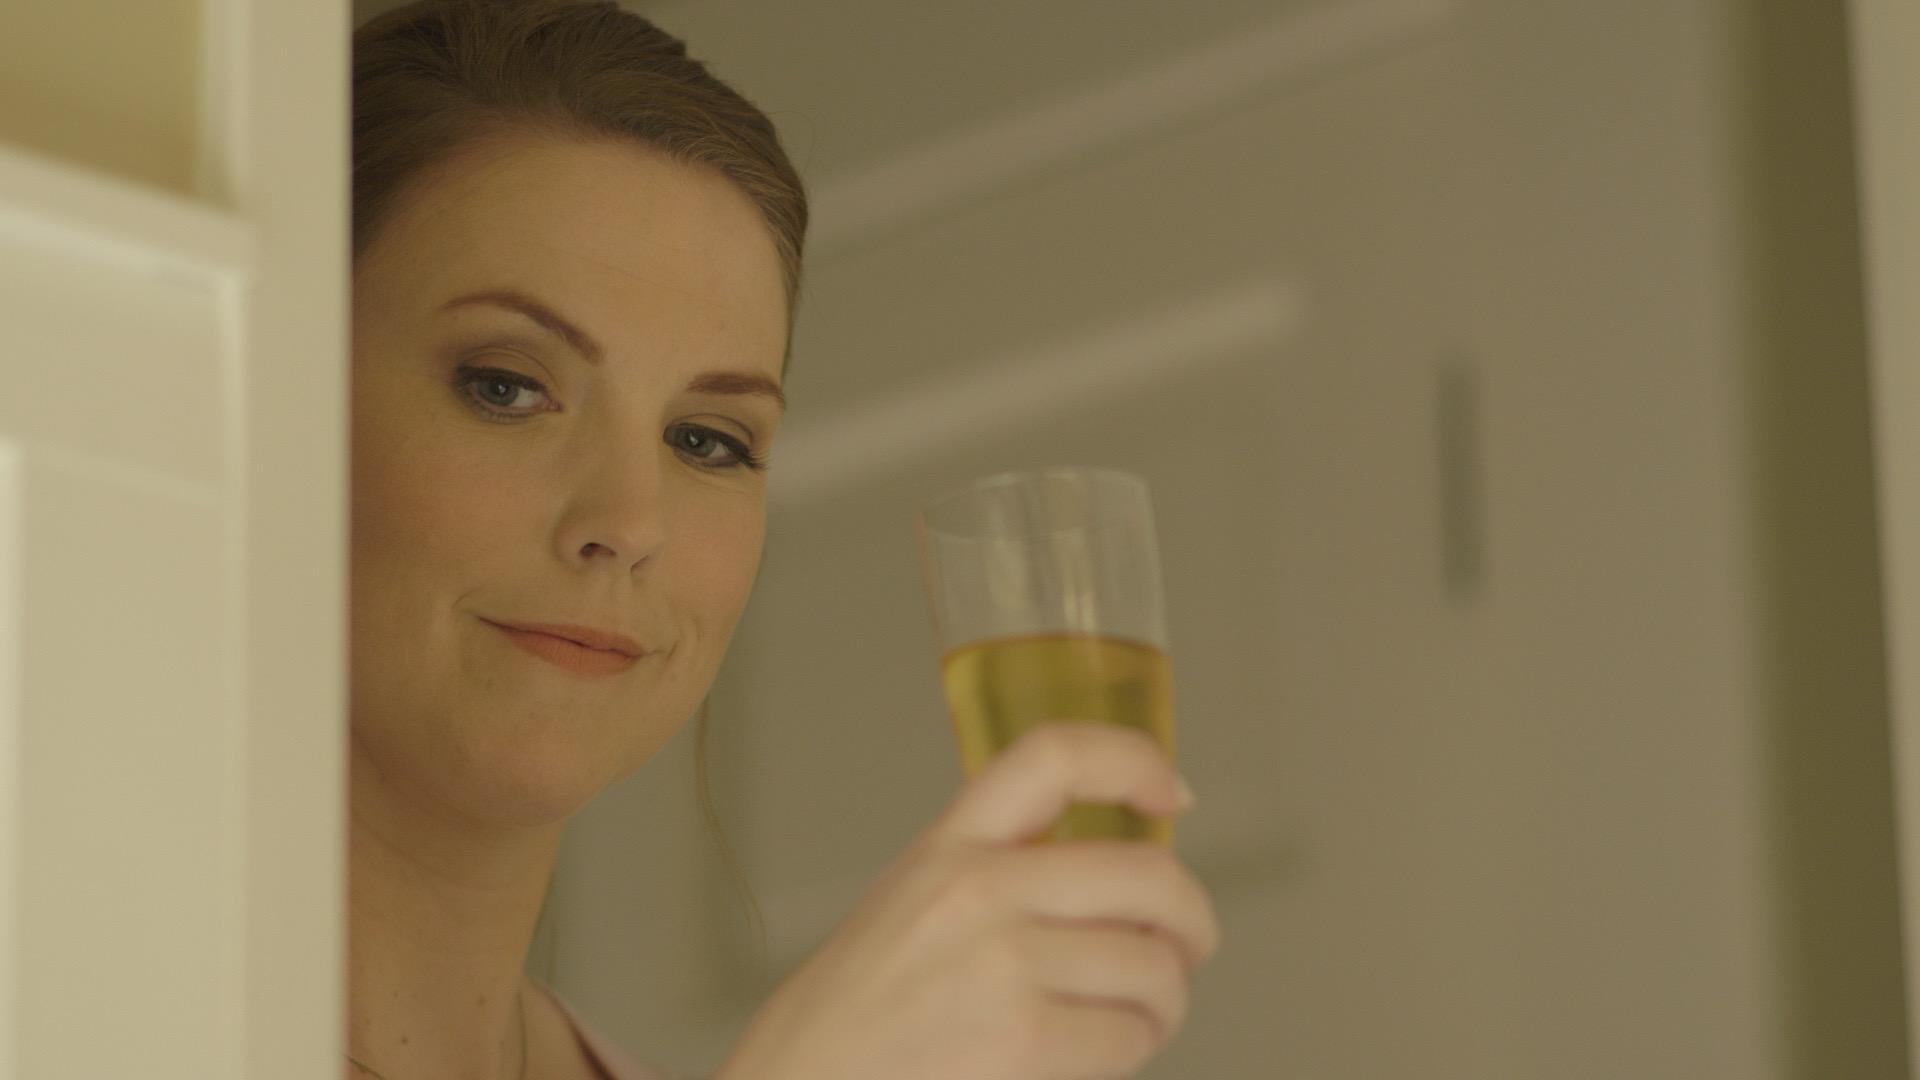 screen grab (champagne glass in door).jpg